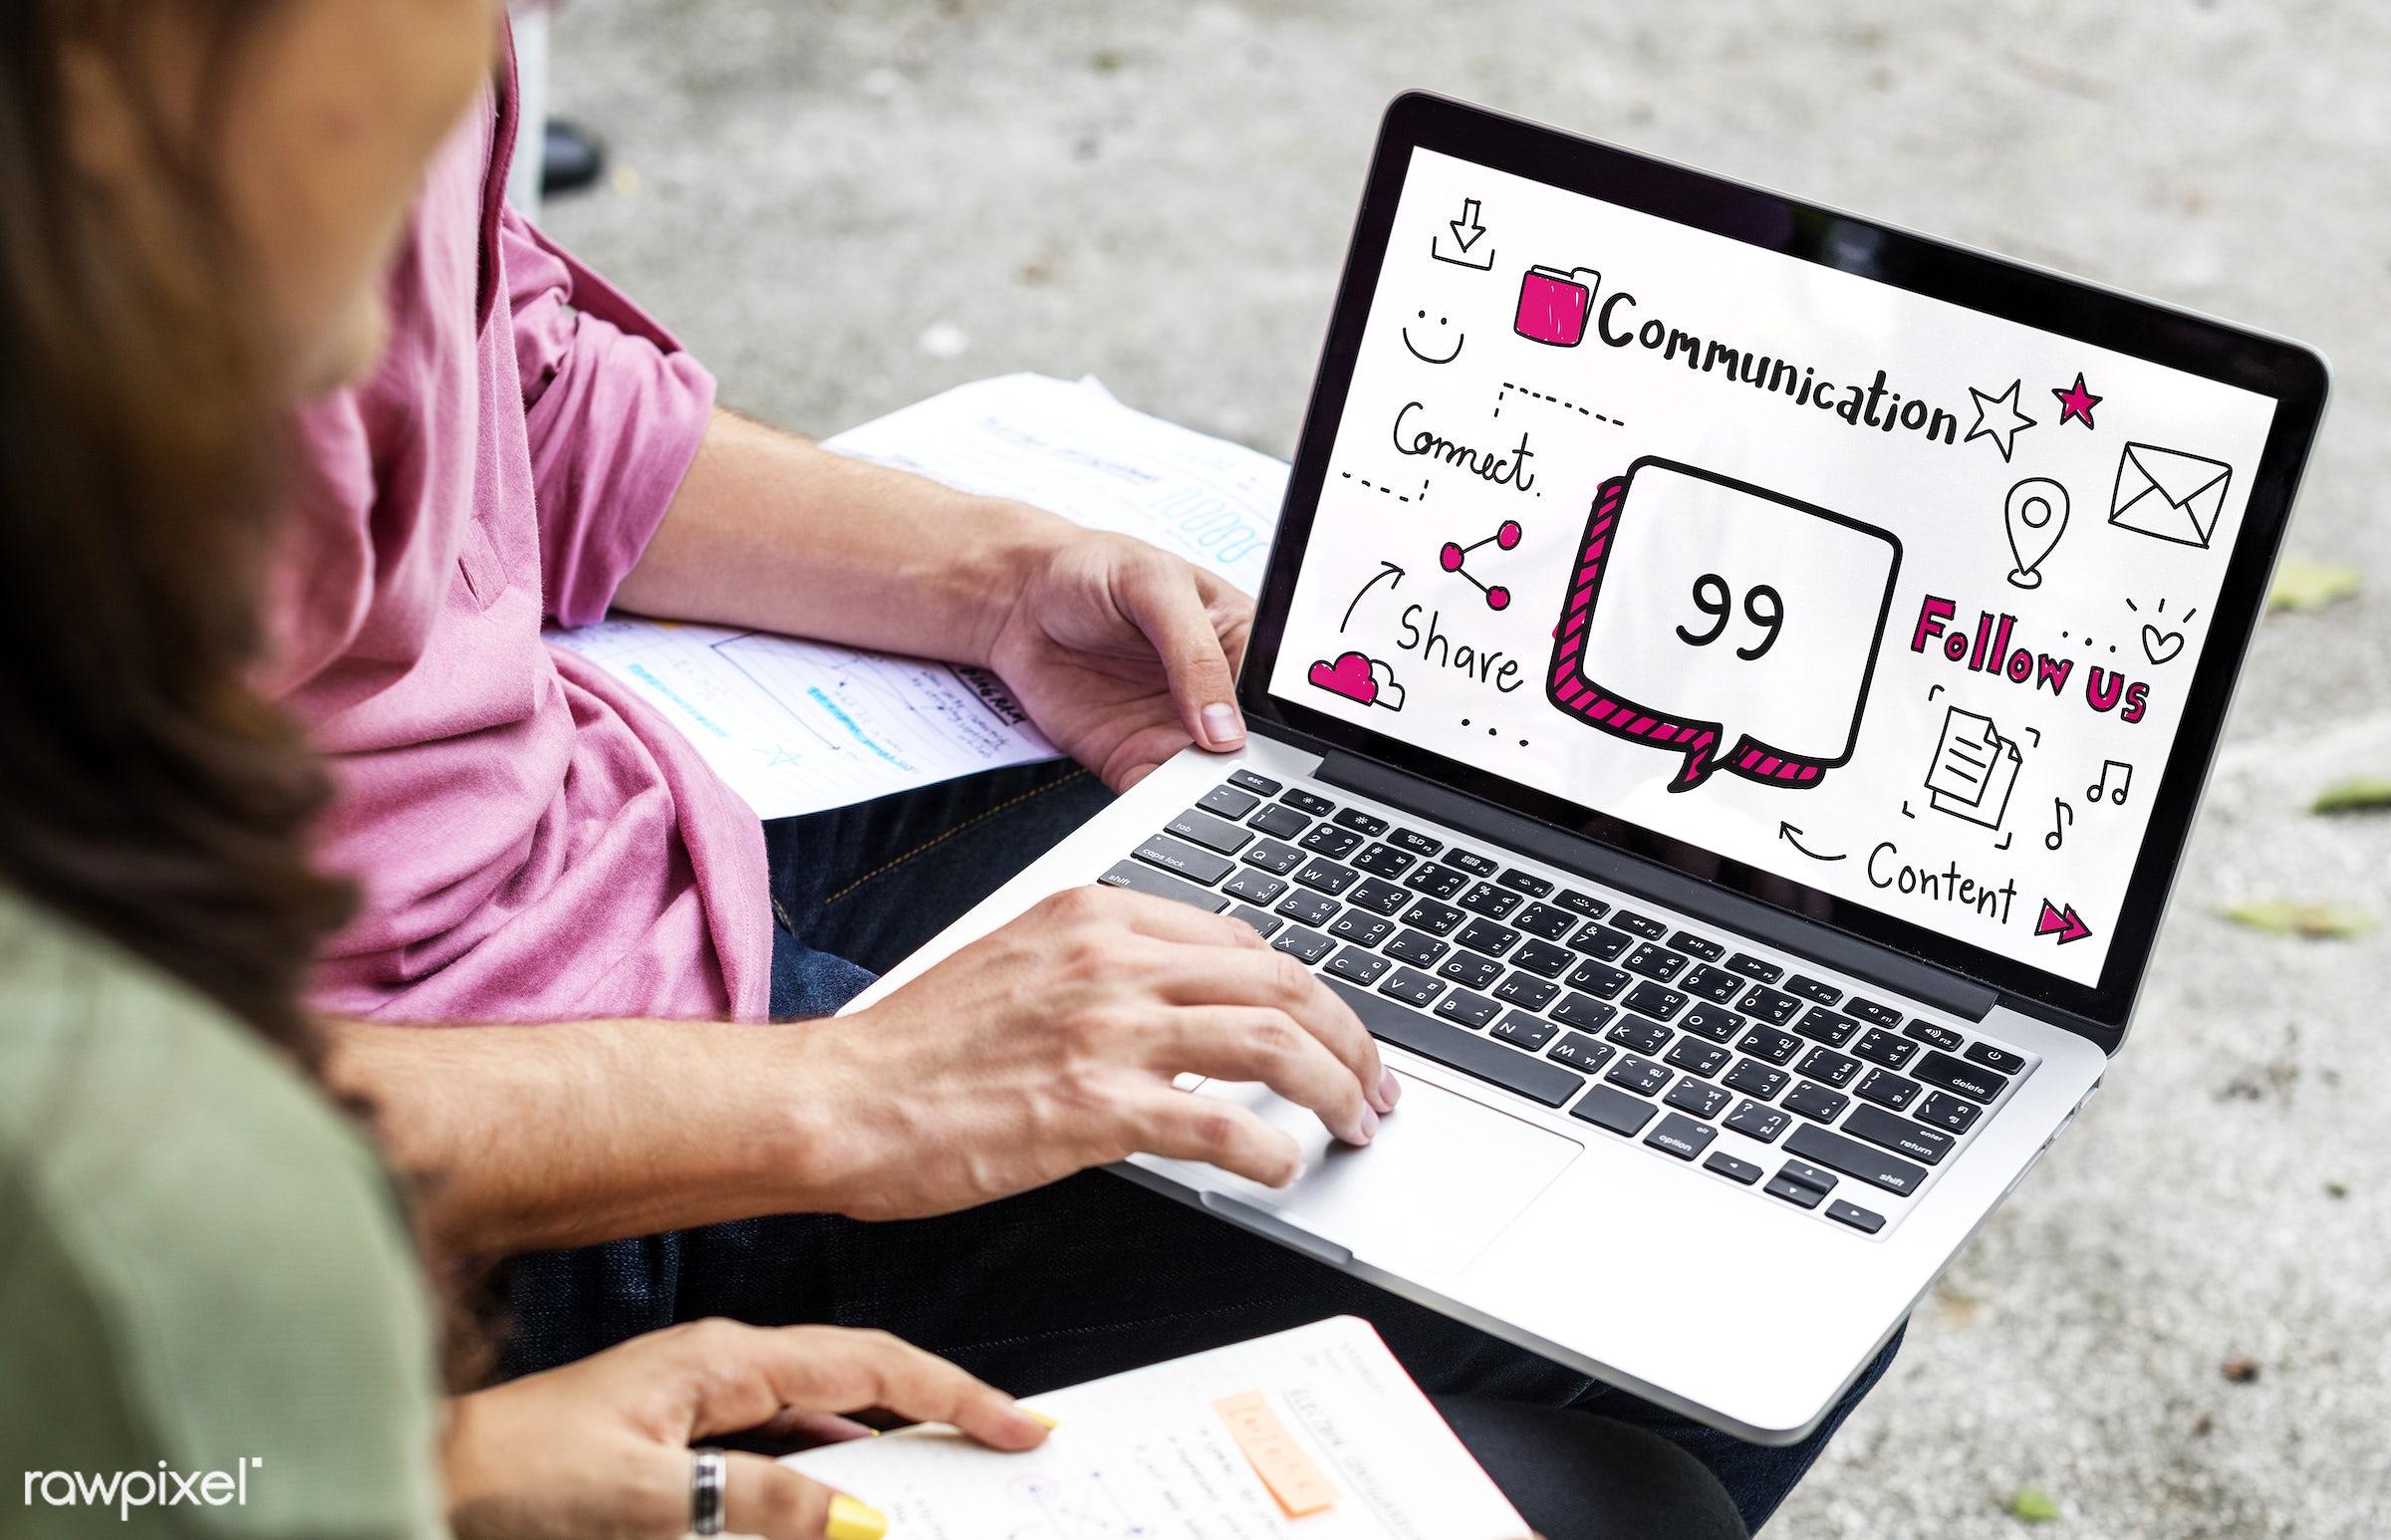 asian, blog, browsing, caucasian, chat, cloud, communication, community, connected, connection, content, conversation,...